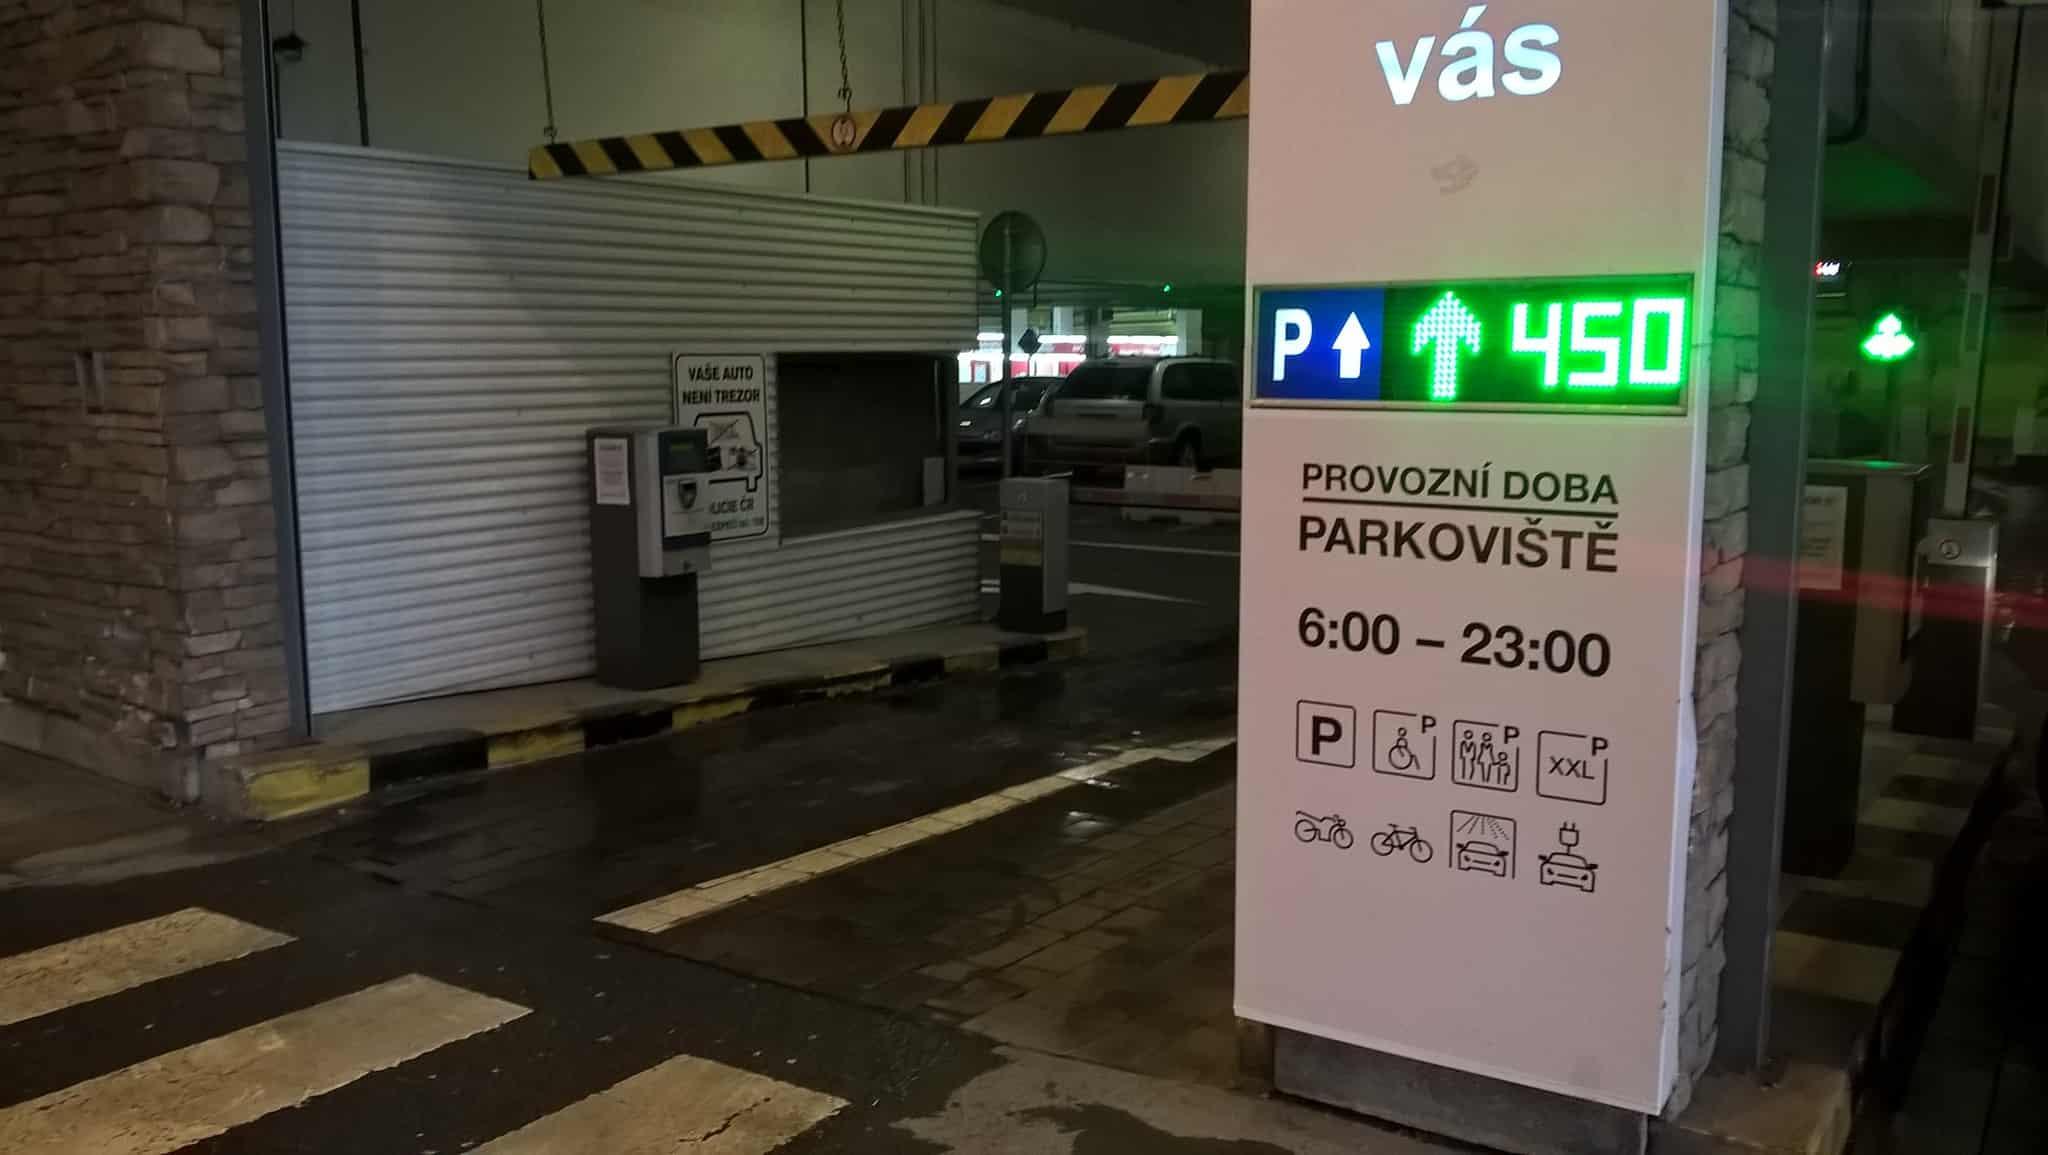 Obrázek článku: reference/oc-chodov-parkoviste-03.jpg